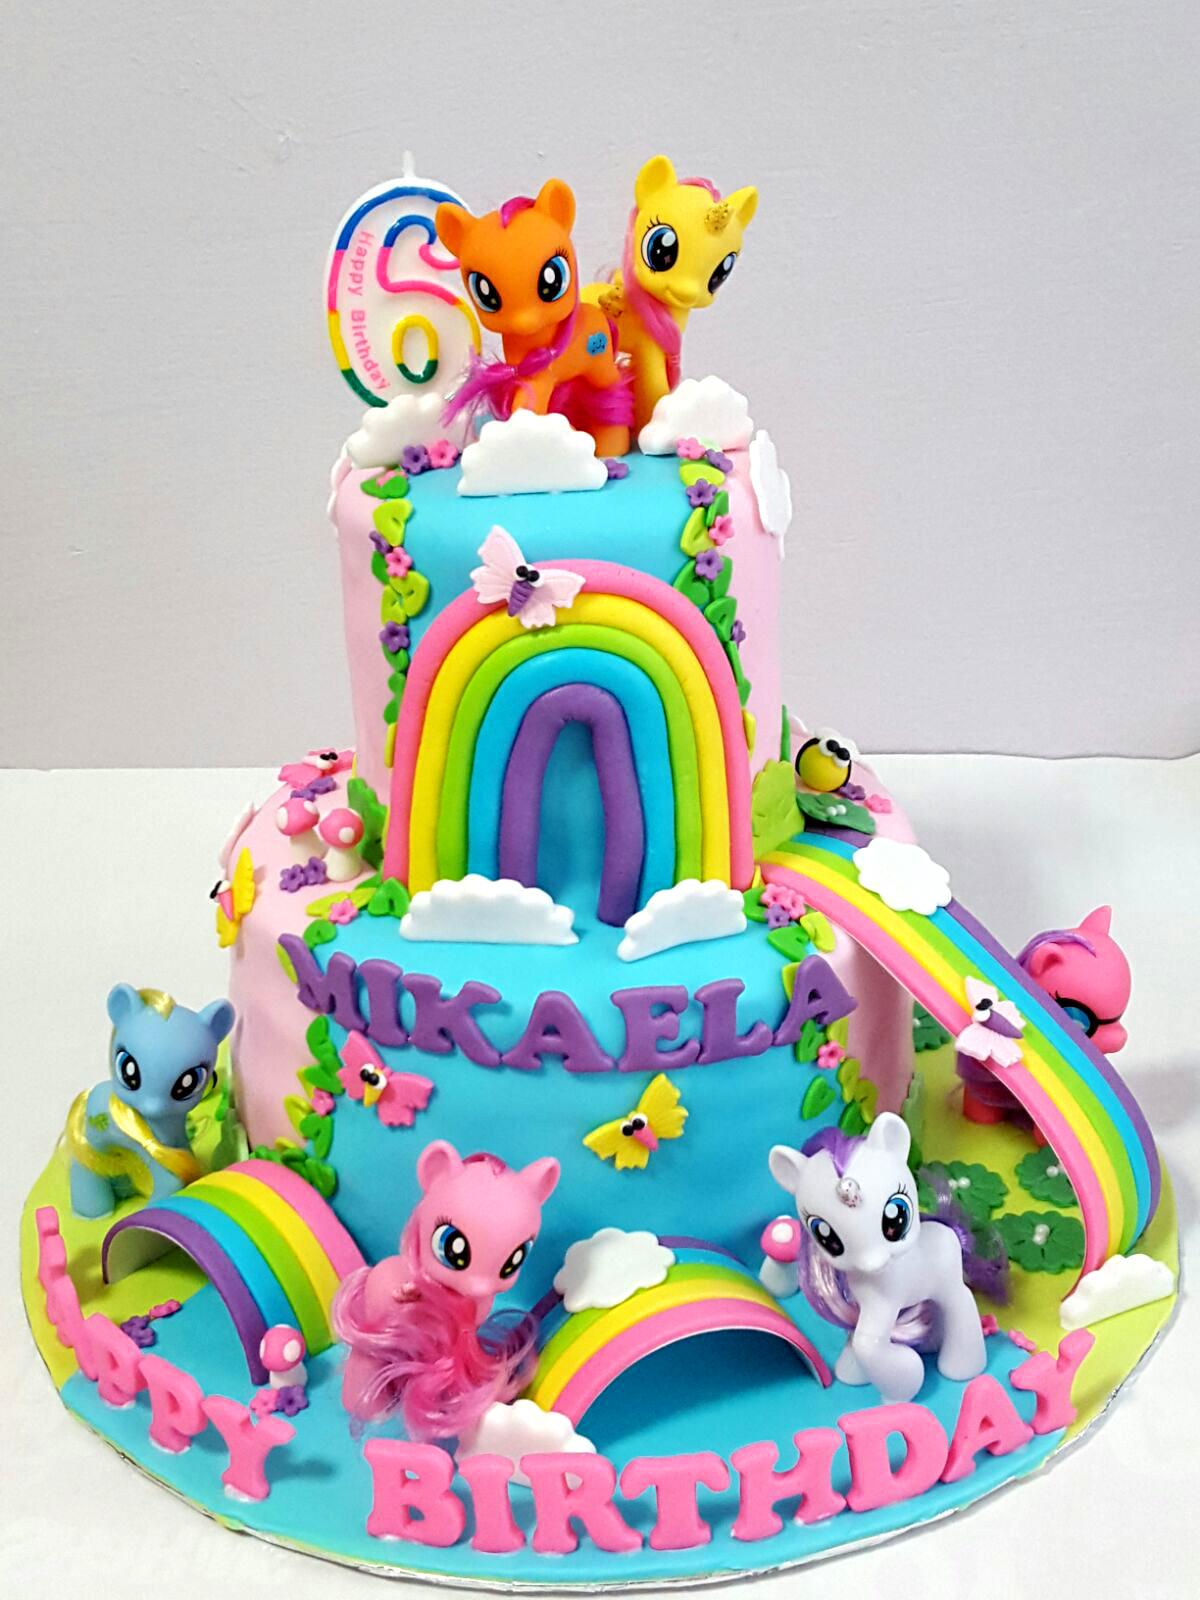 Oven Creations Happy 6th Birthday Mikaela